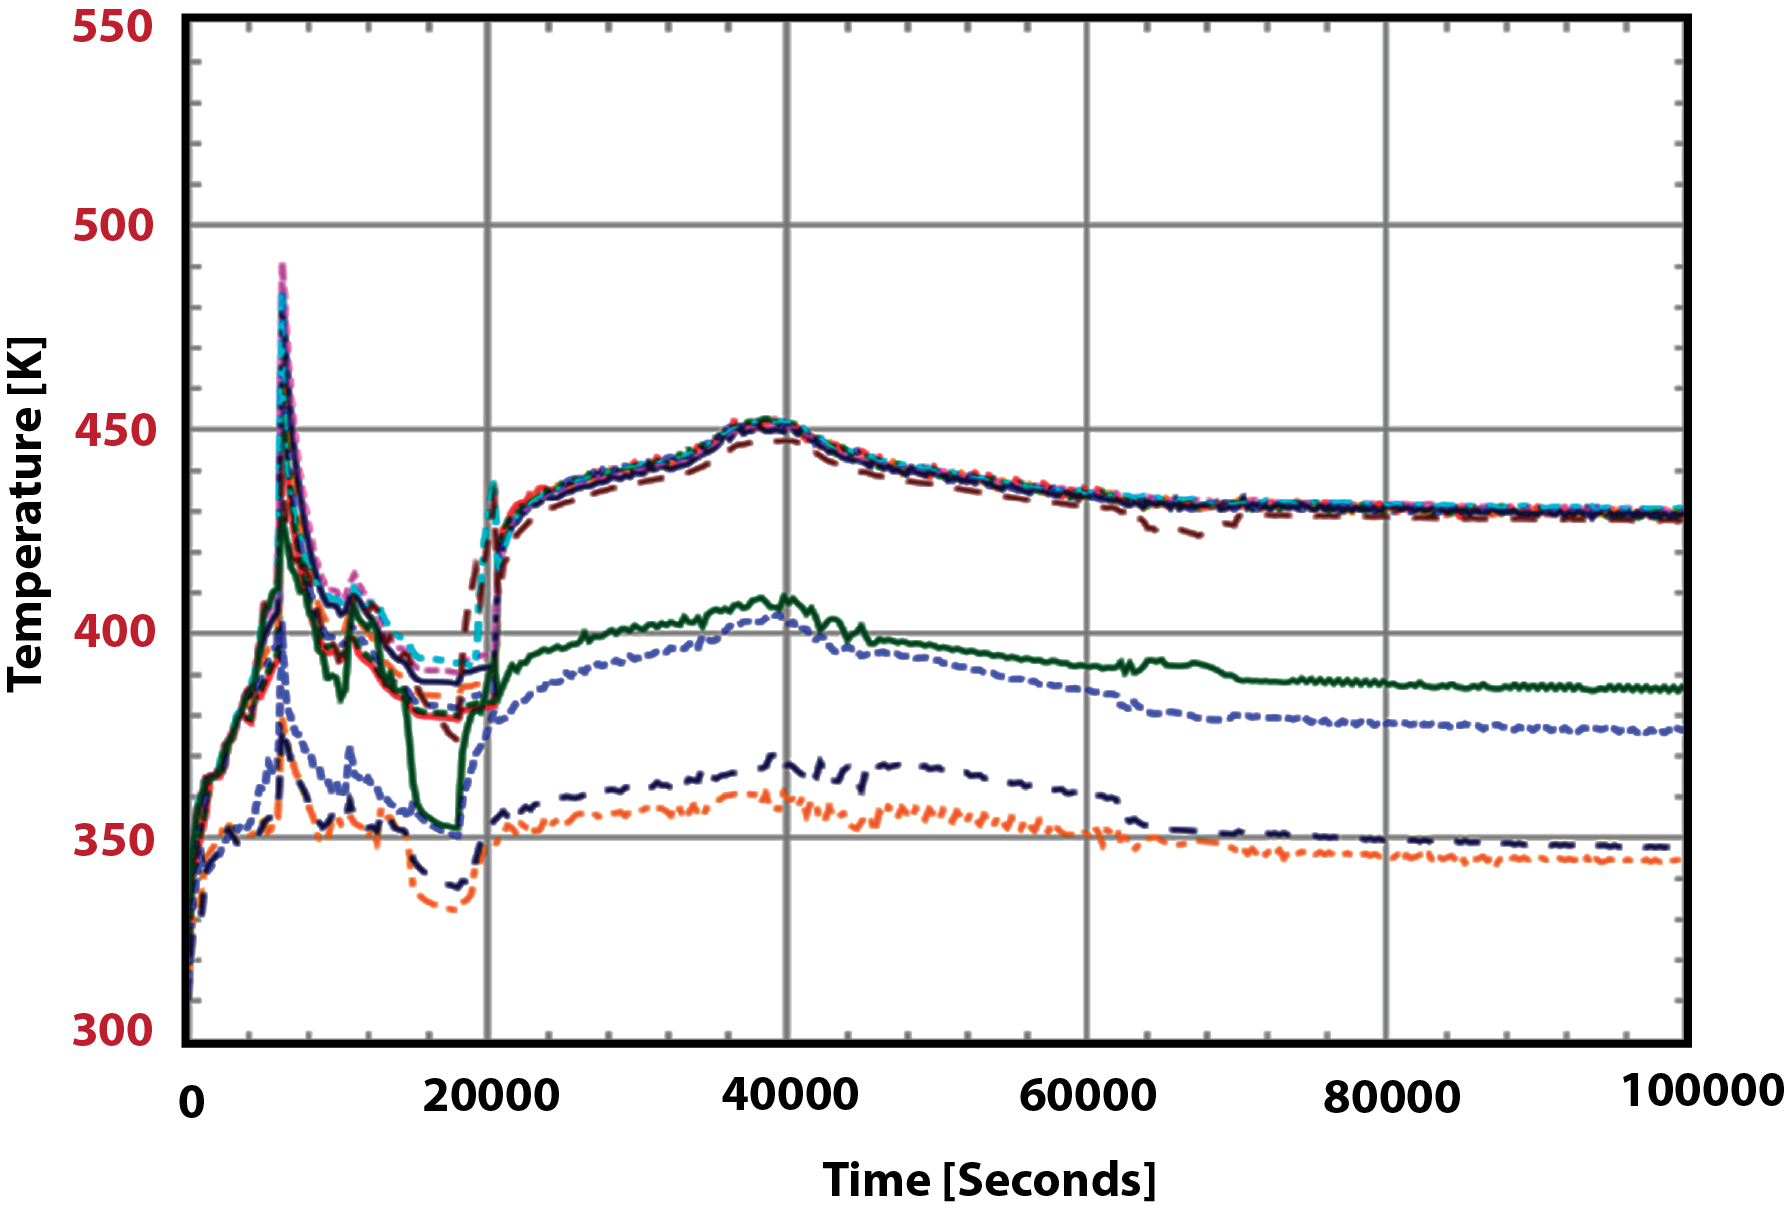 Figure 7 Containment Temperature Distribution